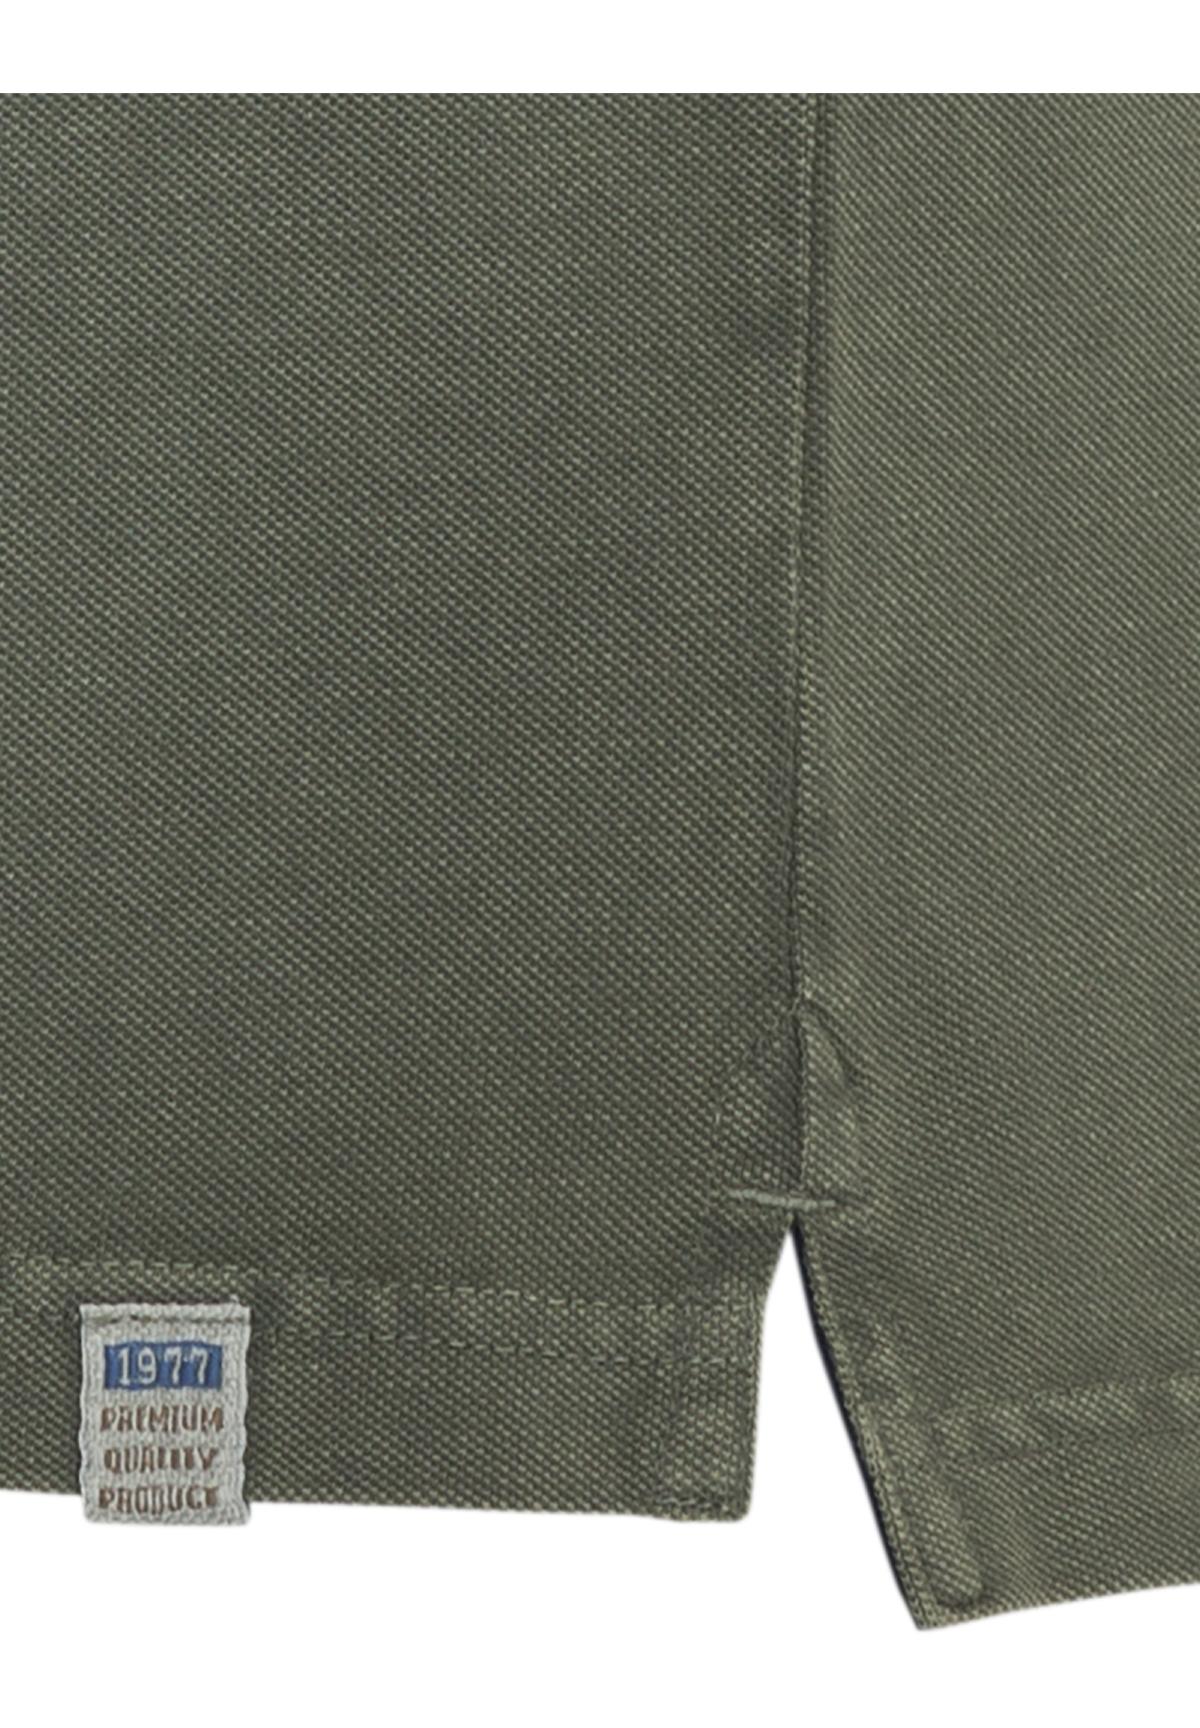 Camel-Active-Herren-Shirt-Poloshirt-Pique-Regular-Fit-NEU Indexbild 79